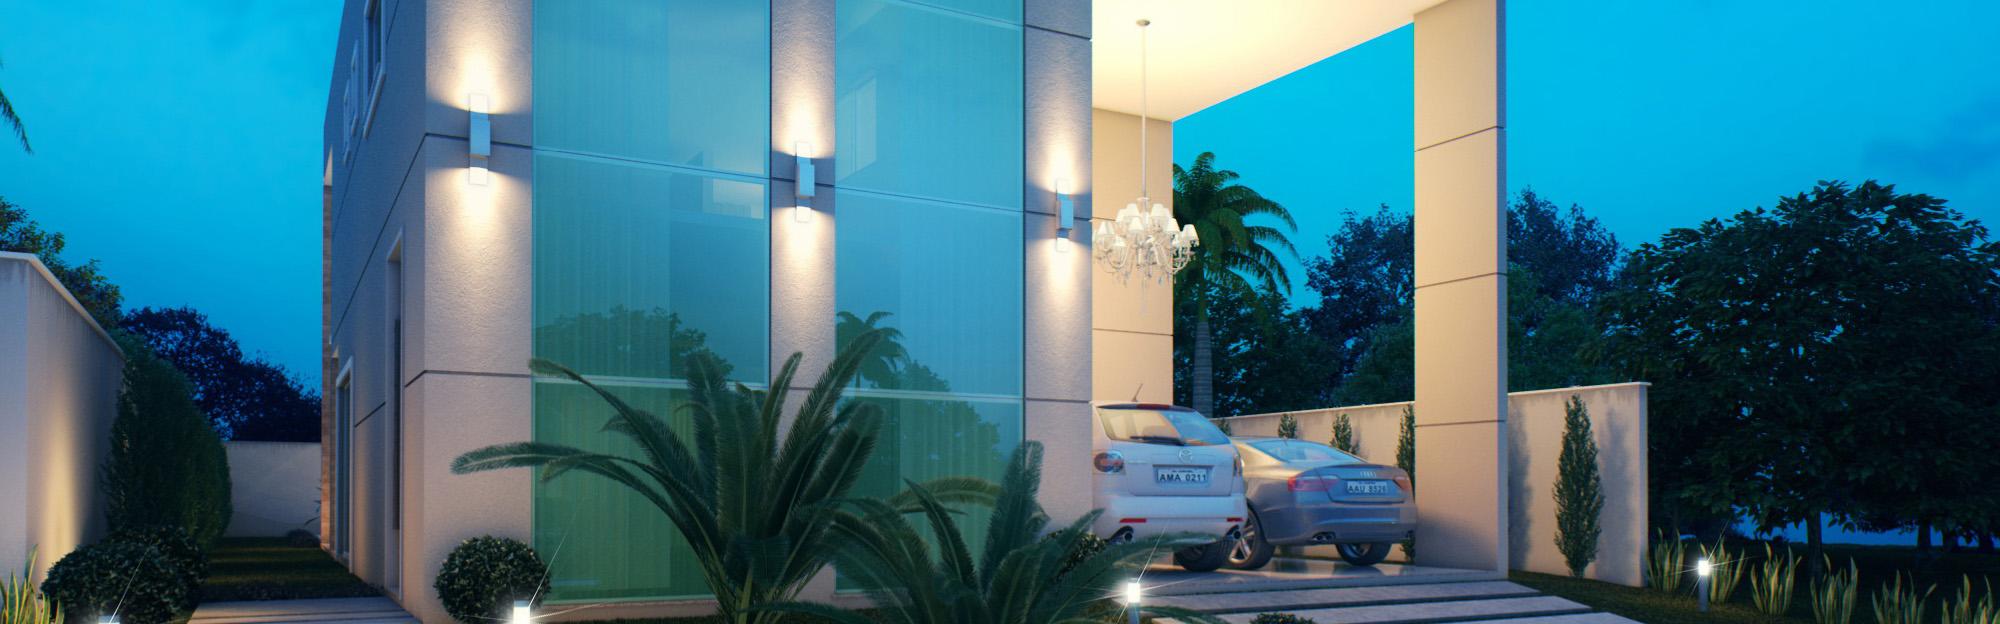 Fachada de casa de Alto padrão no condomínio Jardins Ibiza